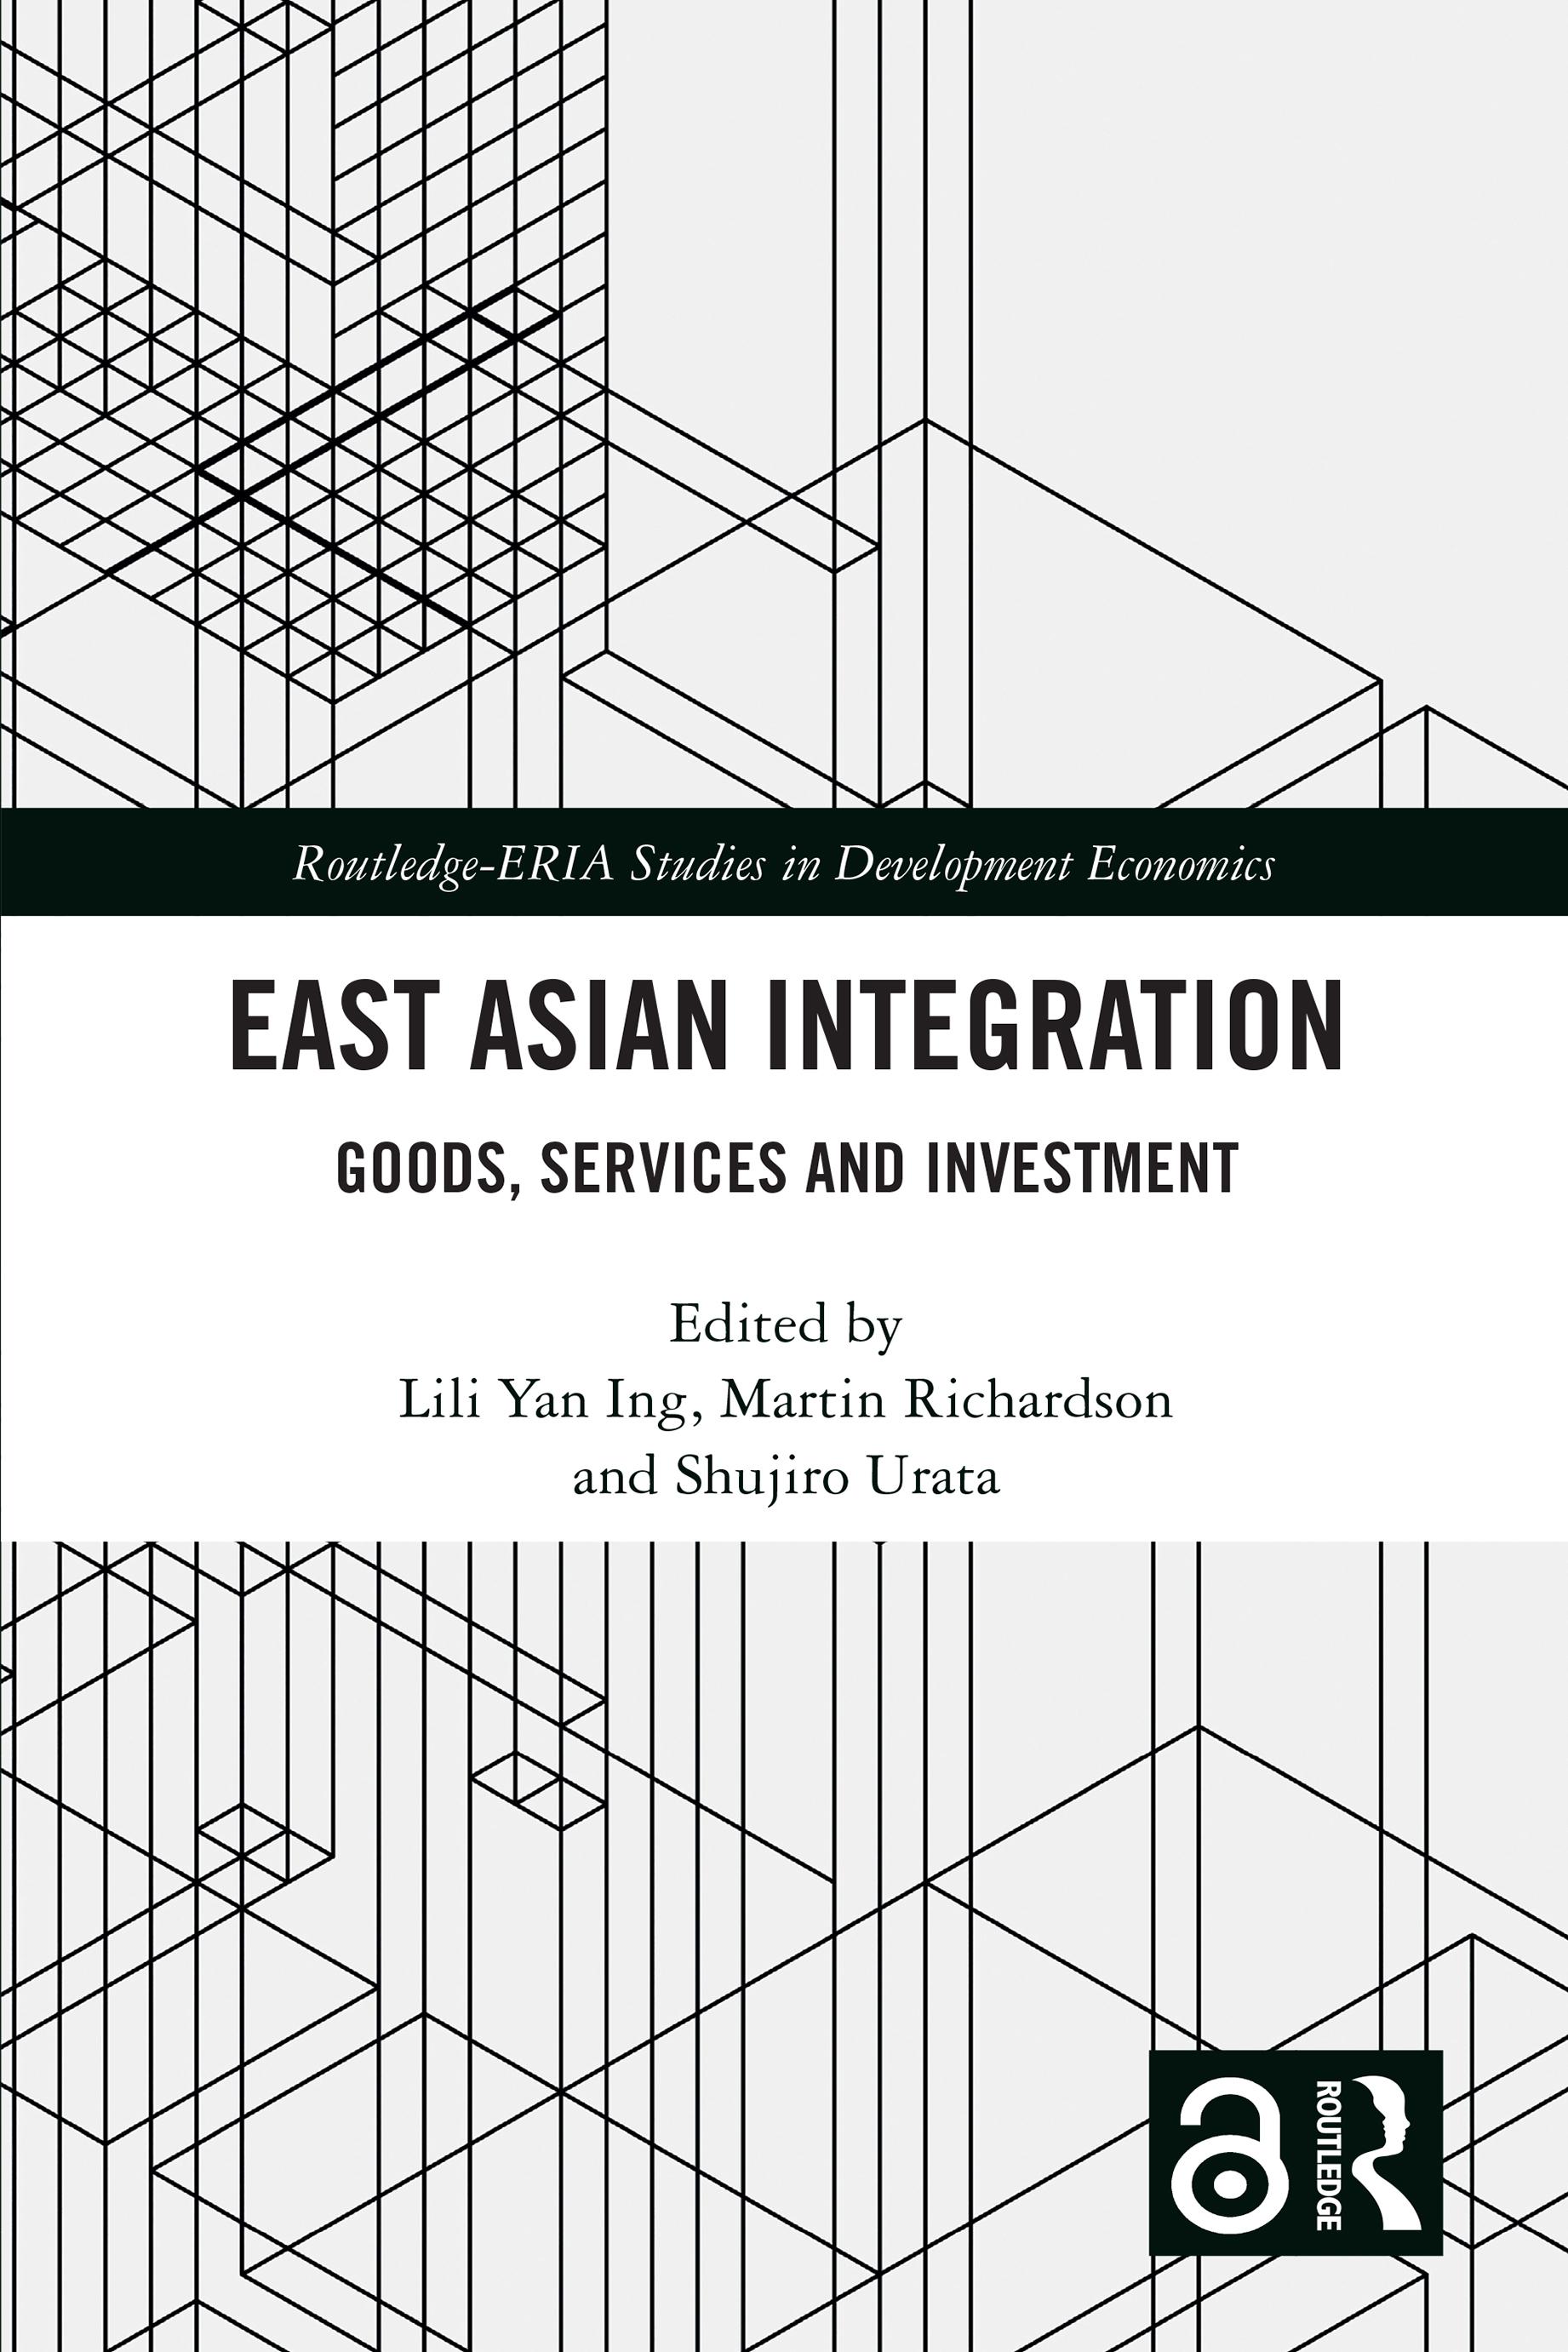 East Asian Integration